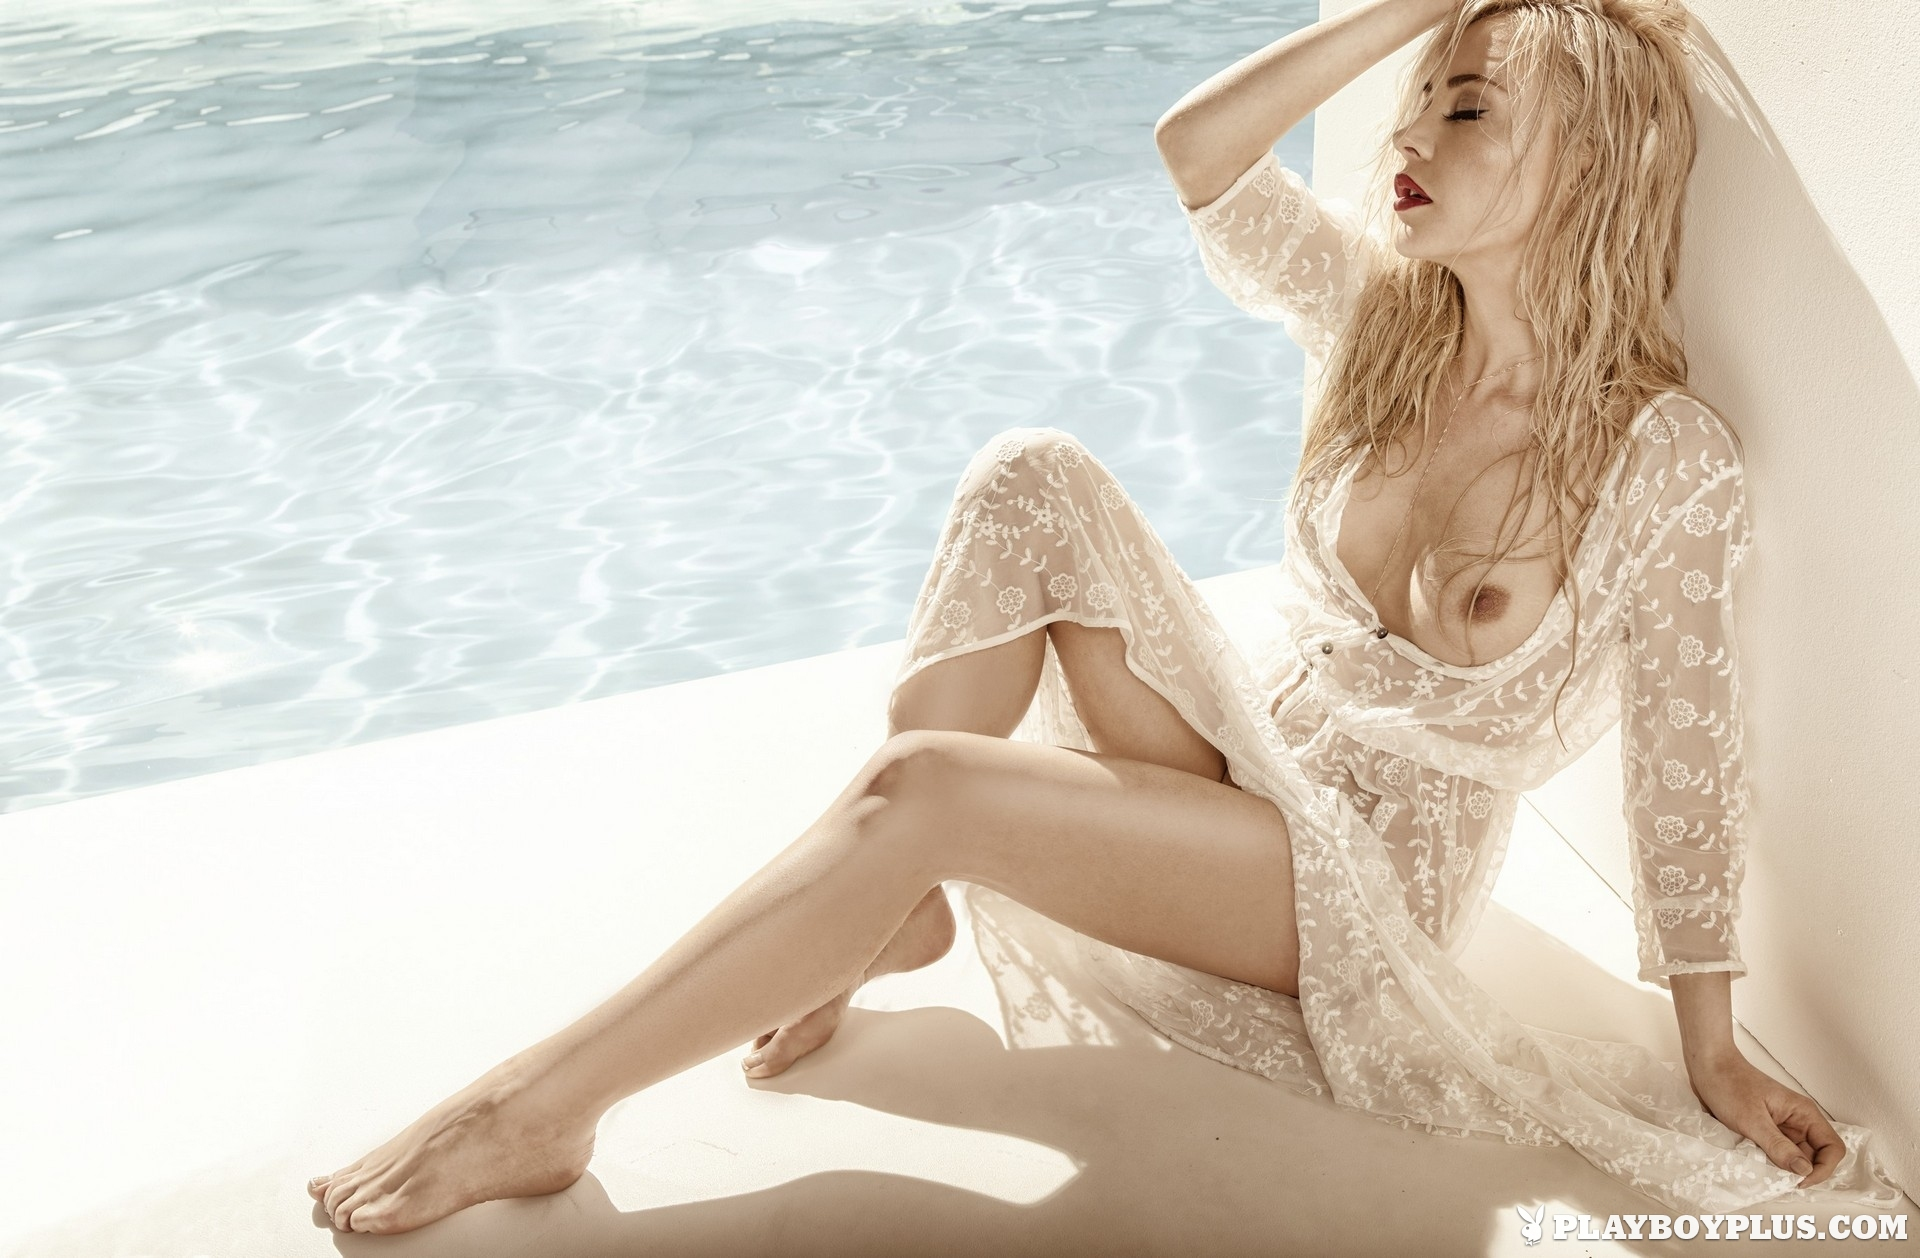 amber-bassick-blonde-nude-underwater-playboy-10